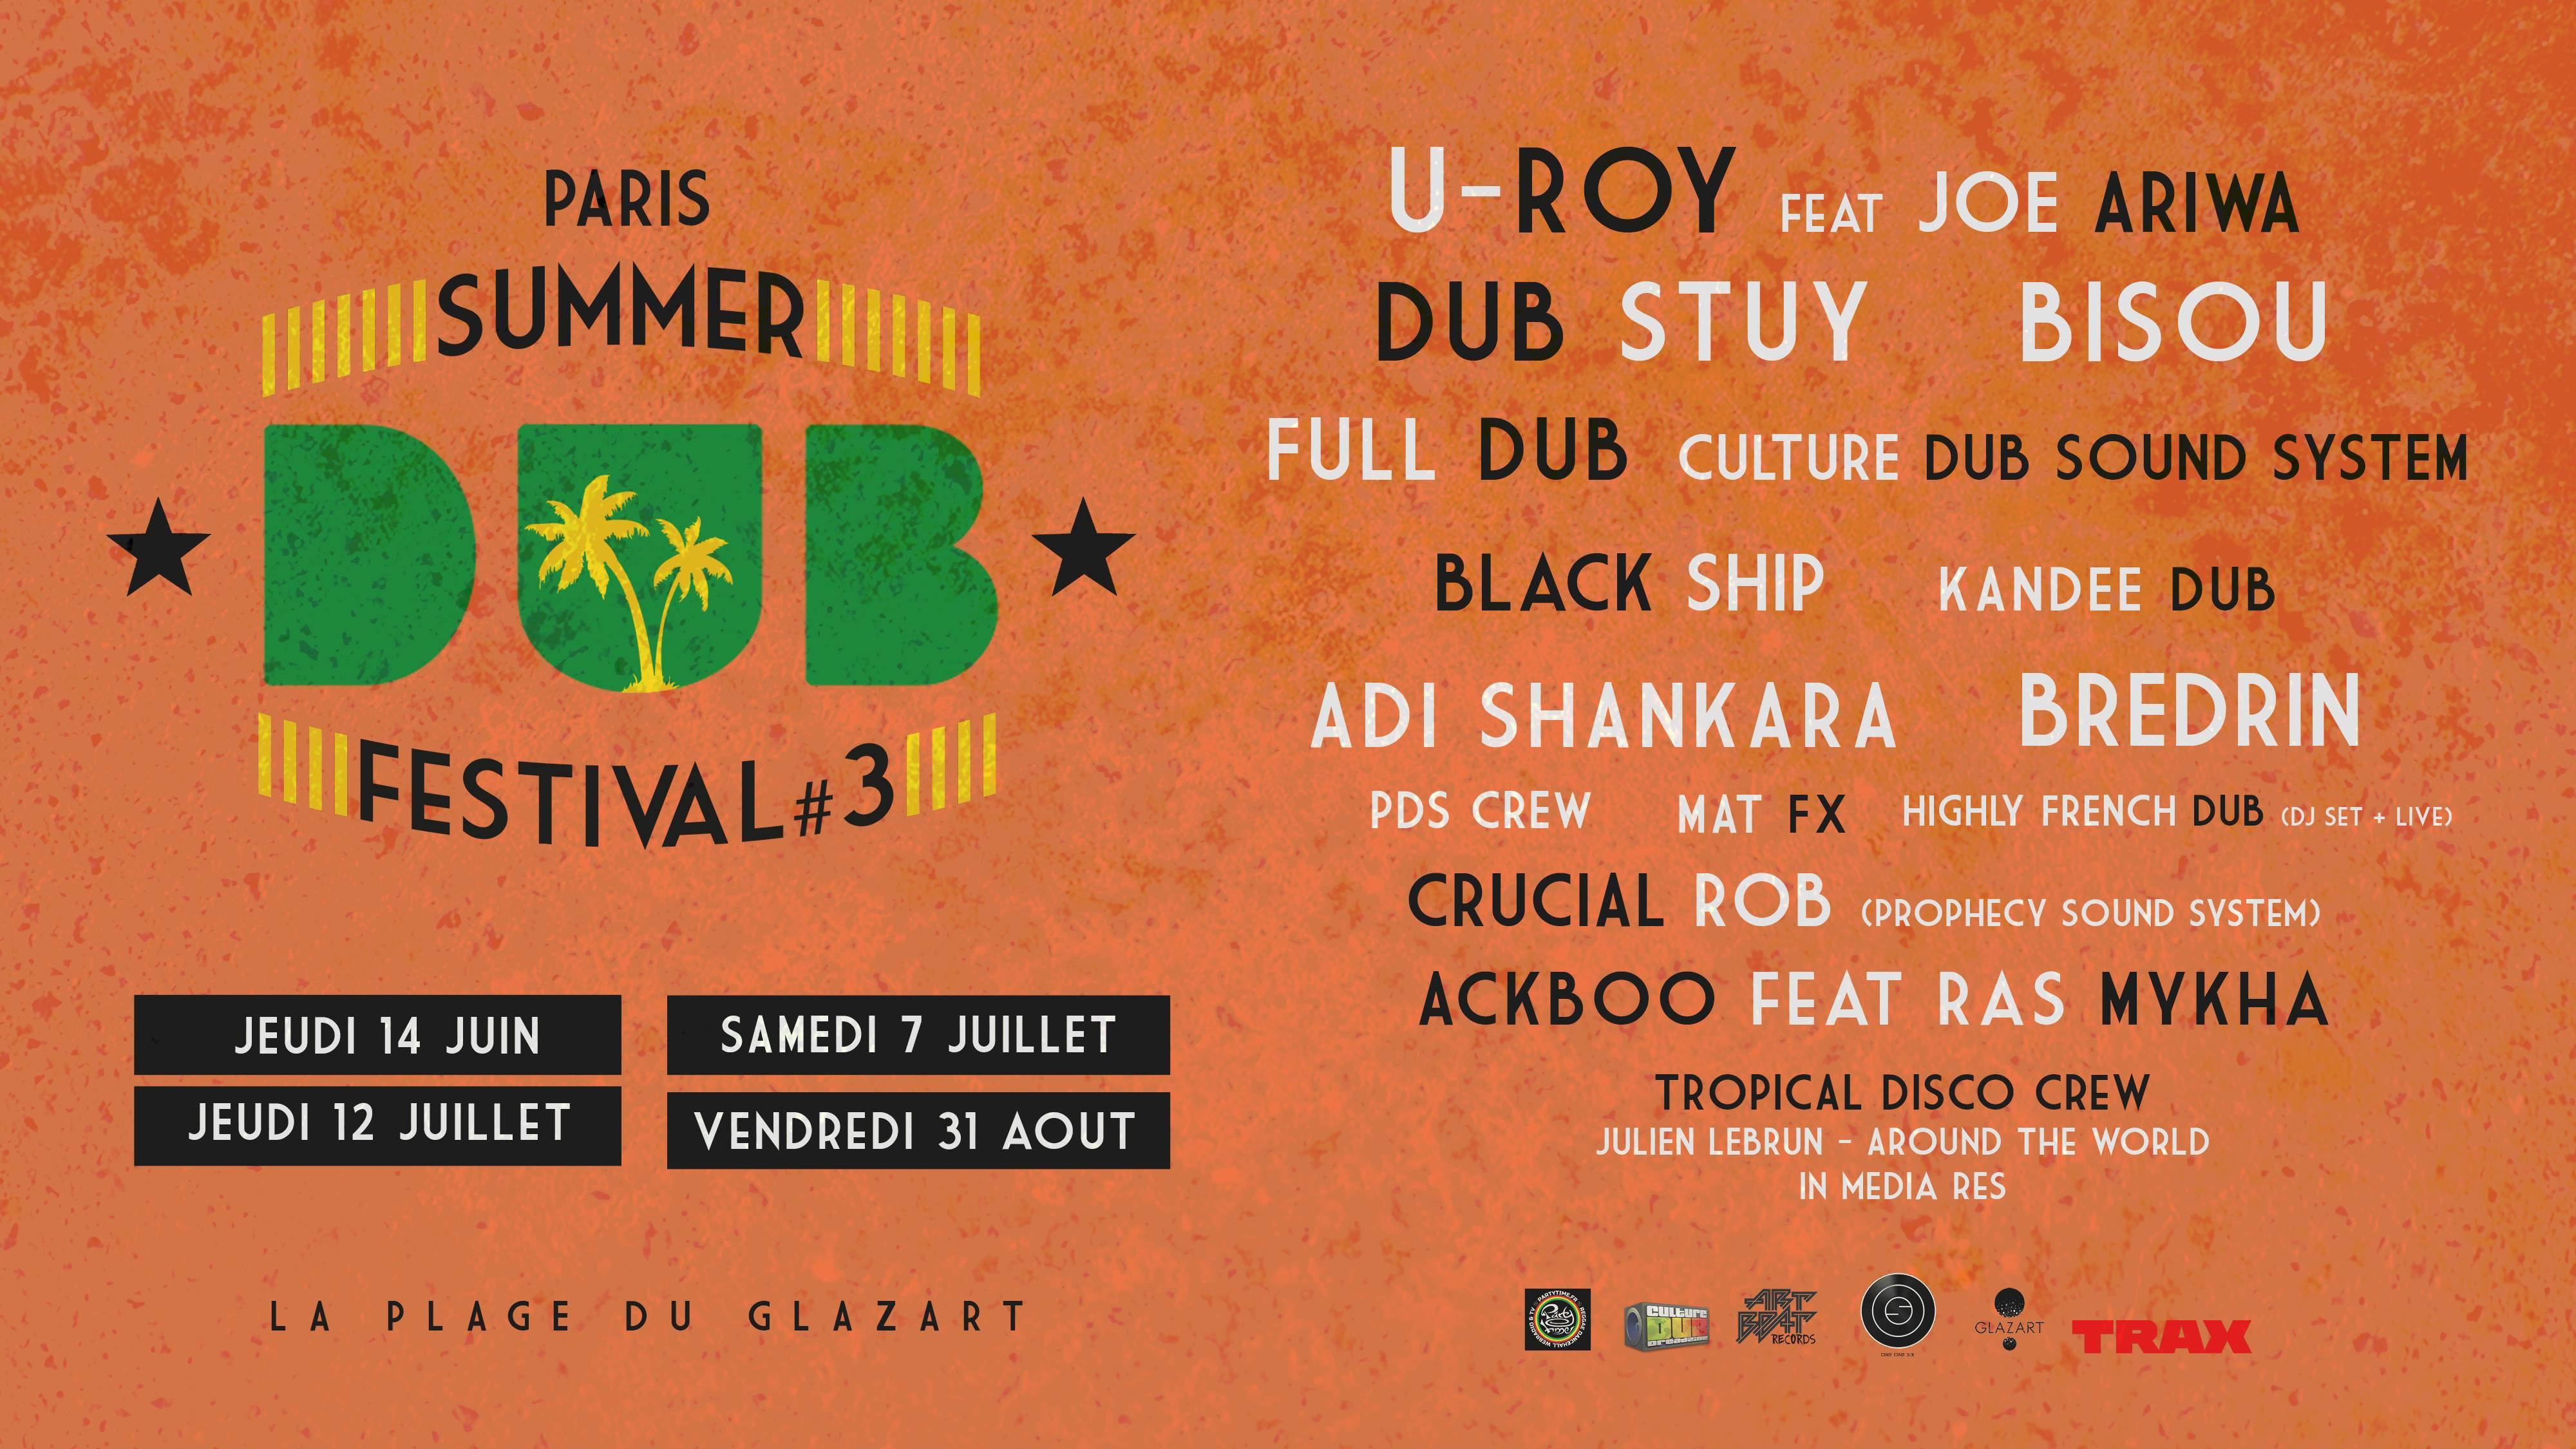 Summer Dub Festival 3